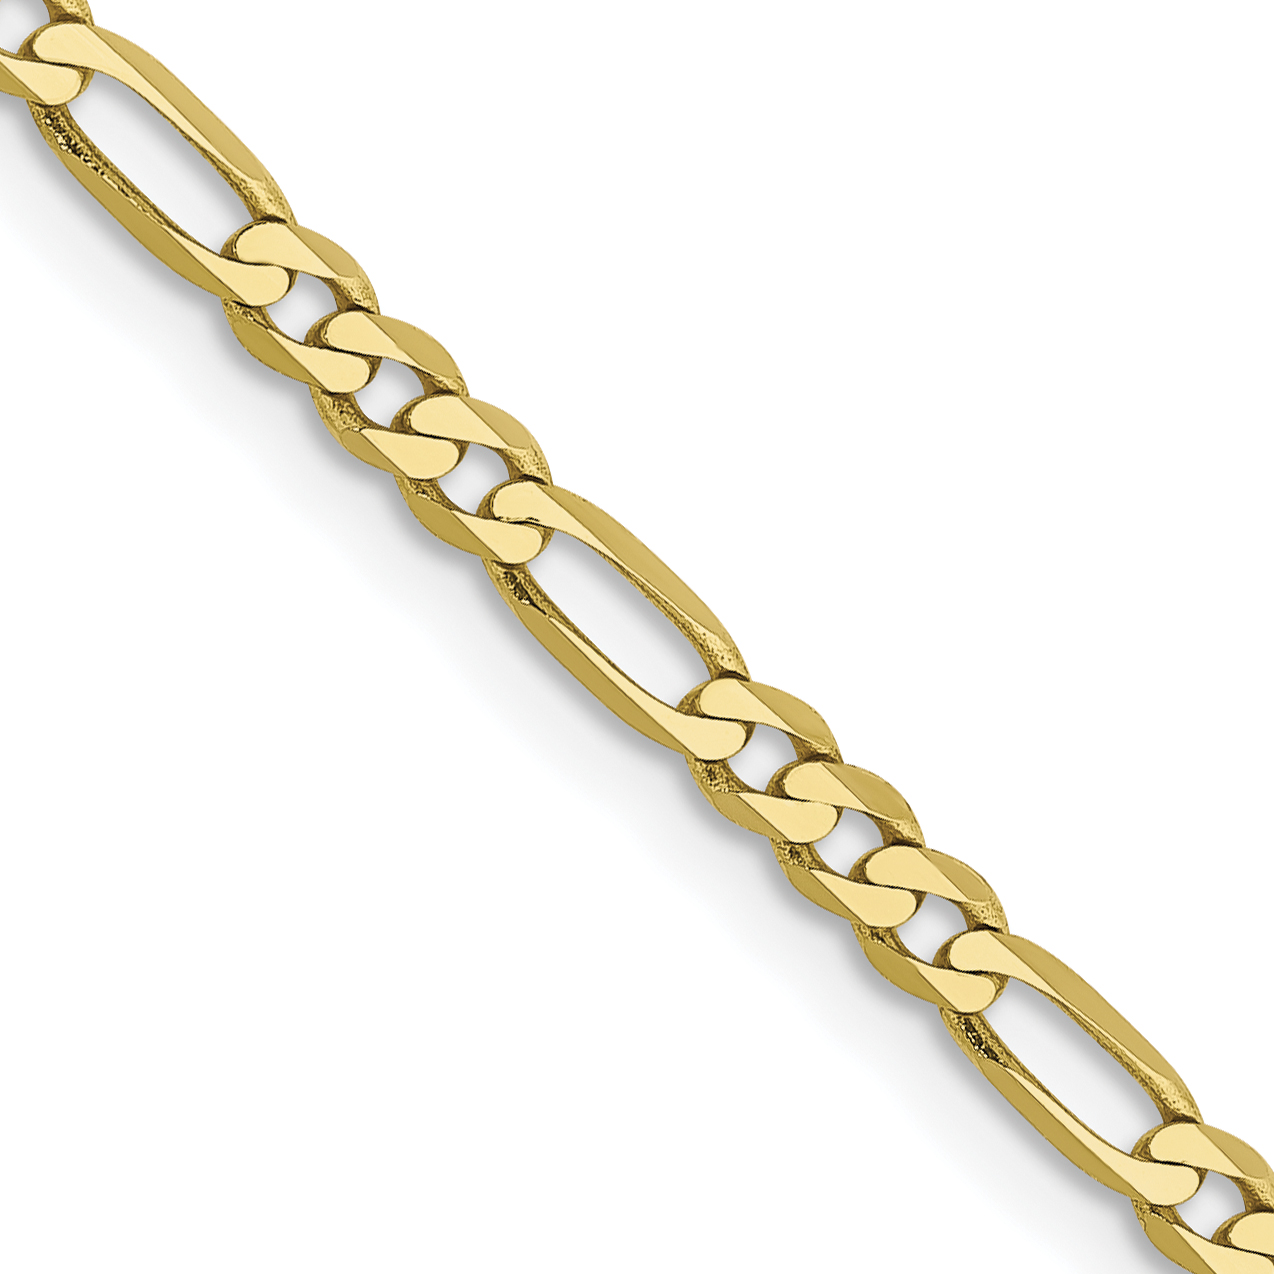 10k 2.75mm Flat Figaro Chain. Weight: 3.59,  Length: 16